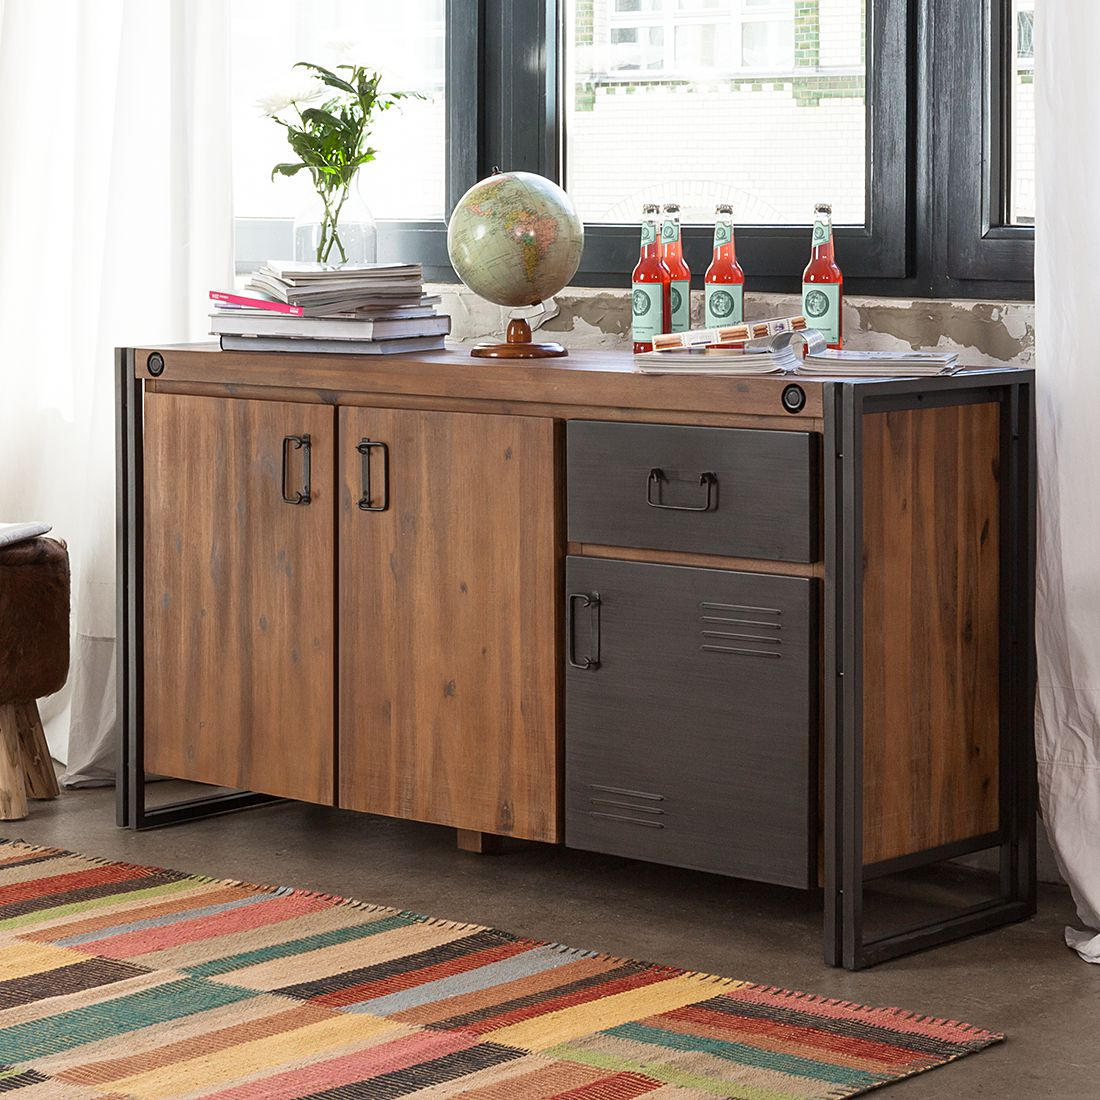 sideboard manchester von furnlab nur 599 99 cherry m bel. Black Bedroom Furniture Sets. Home Design Ideas